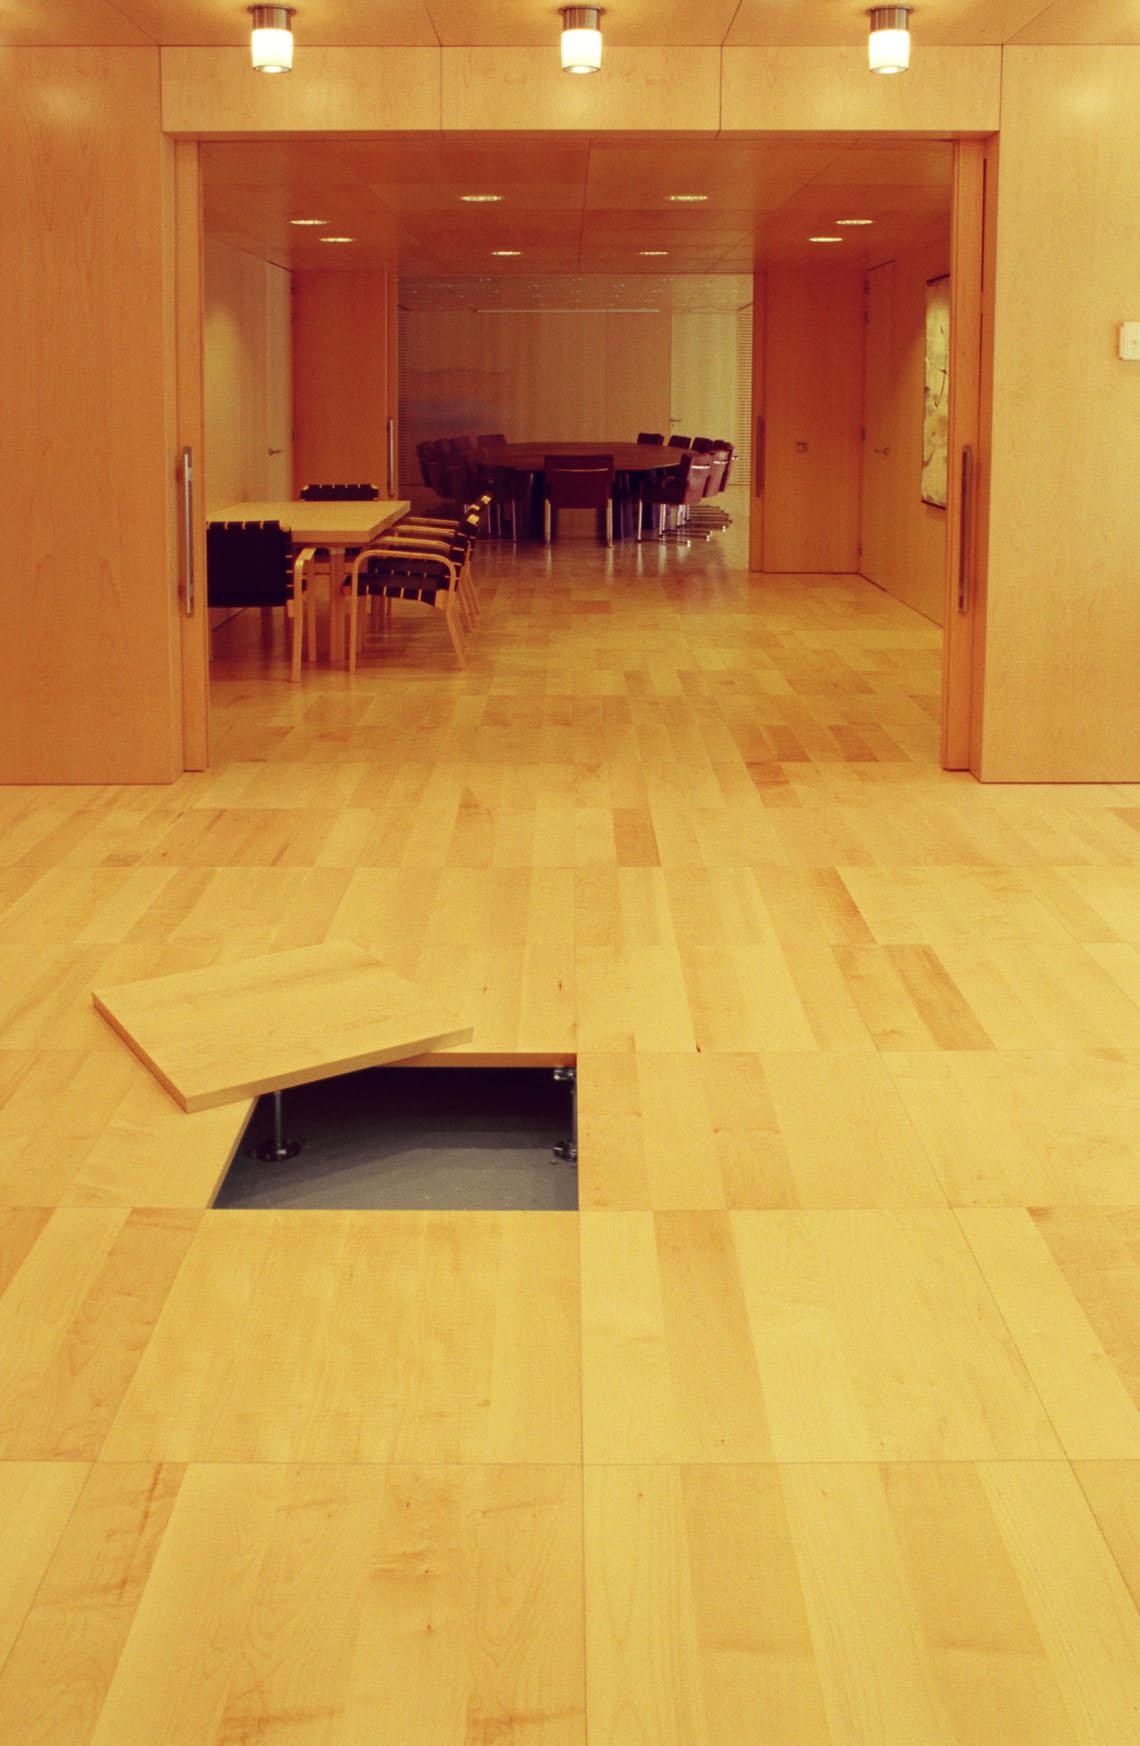 Pavimenti flottanti per interni prezzi pavimento modulare for Pavimento sopraelevato prezzo